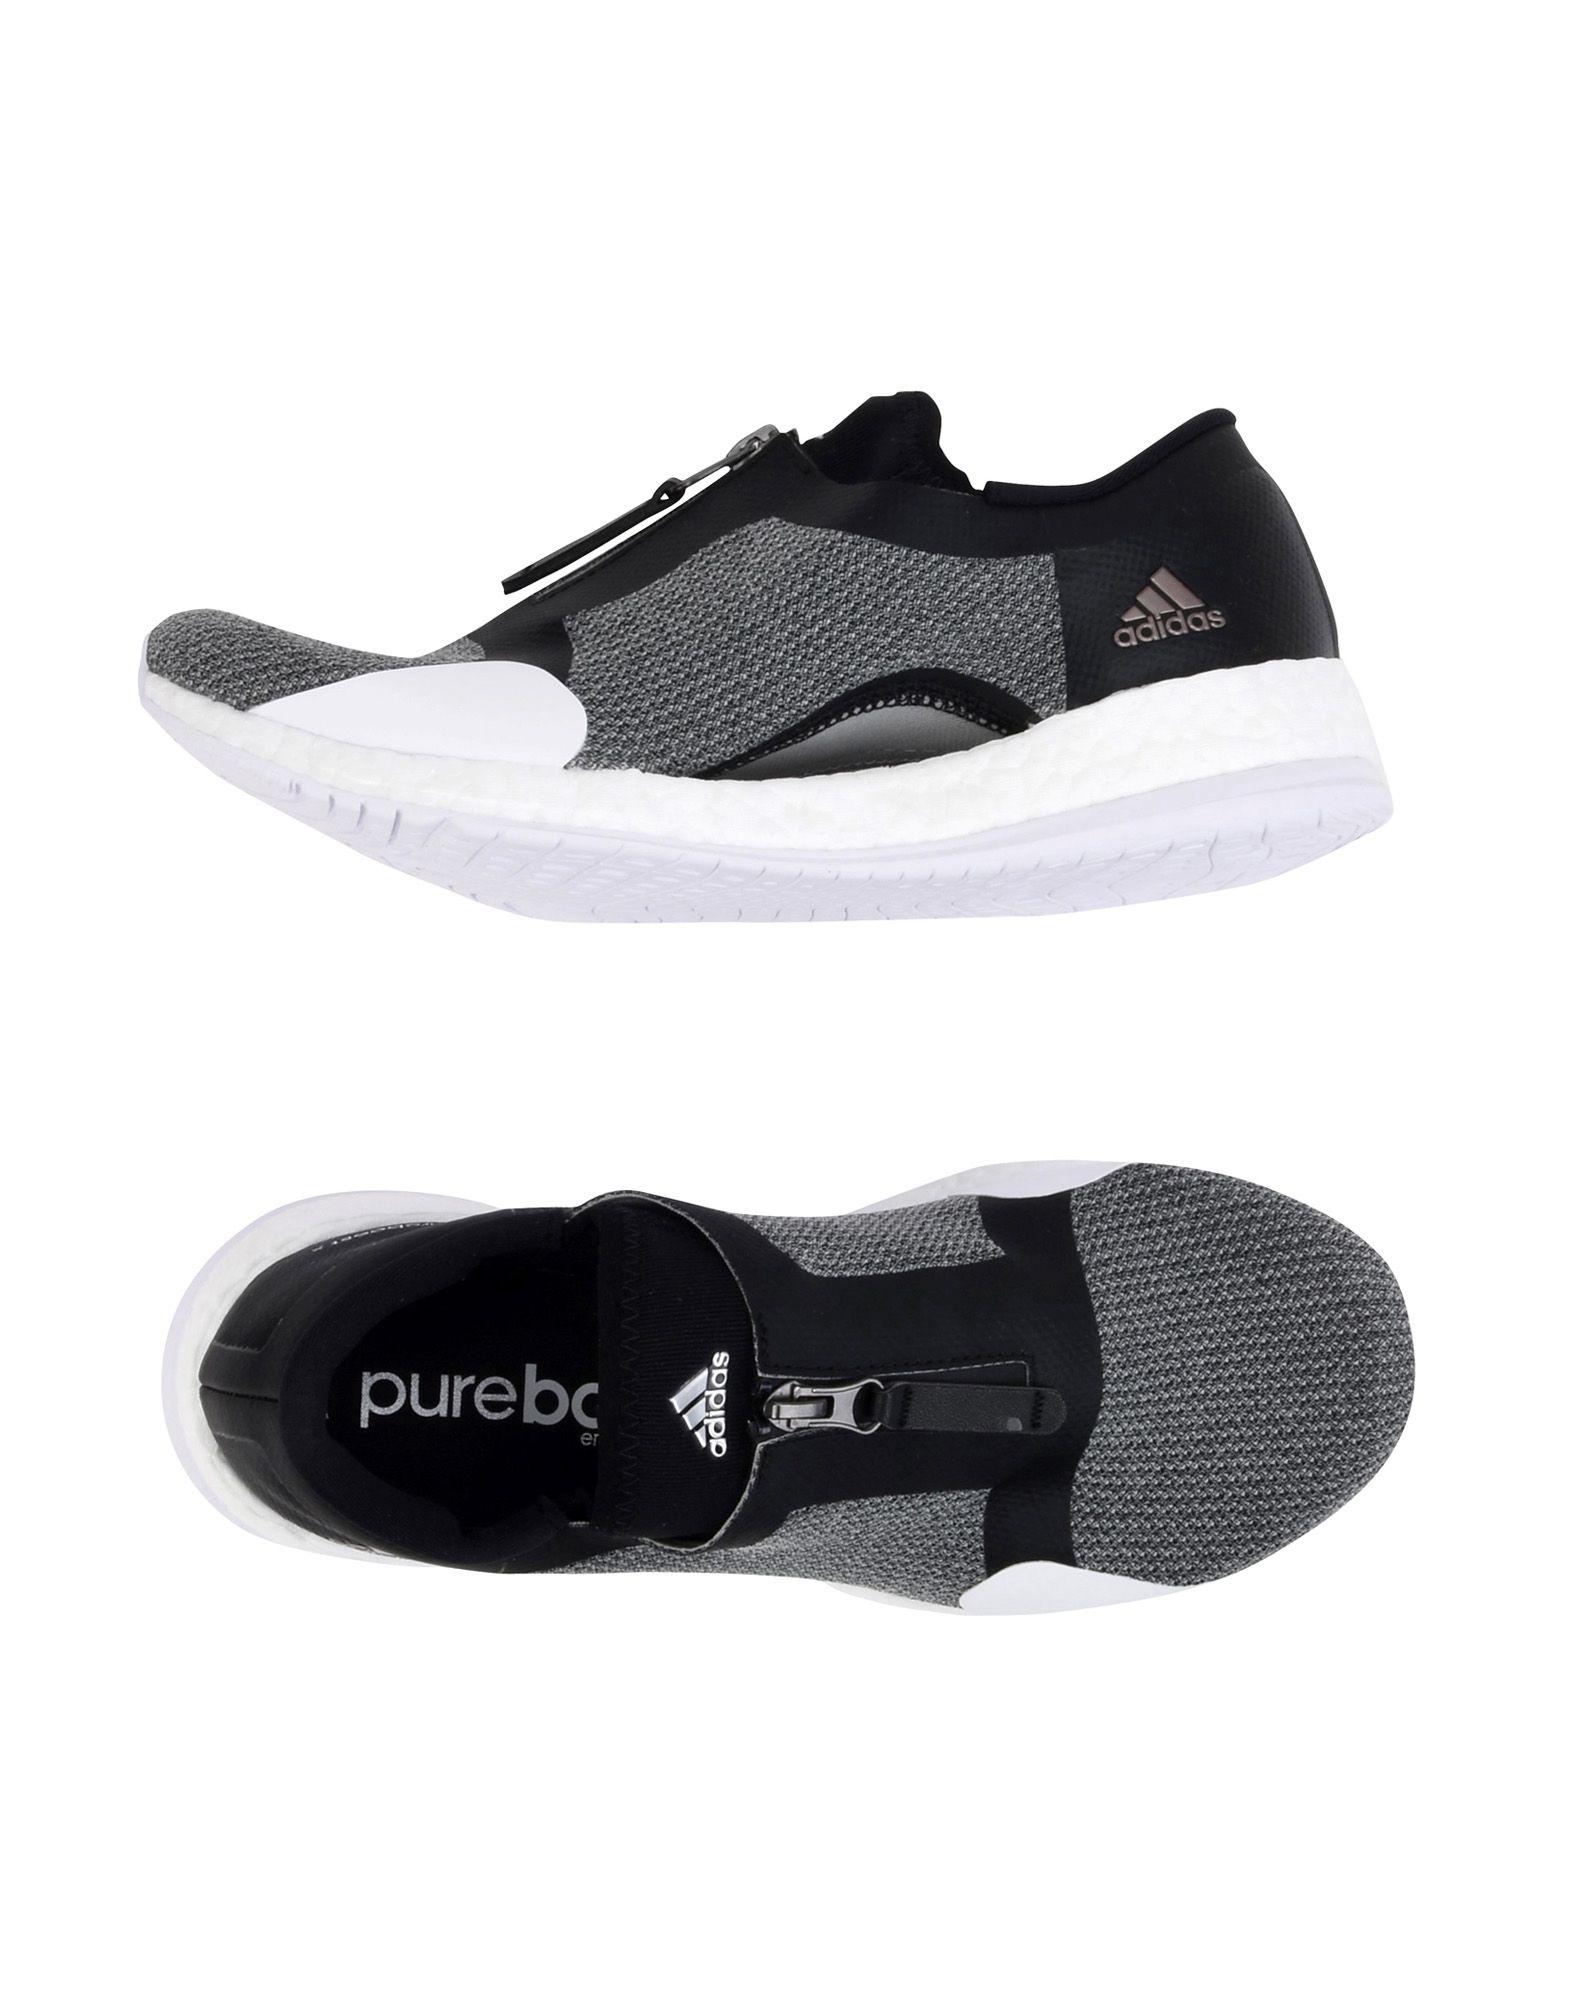 huge discount cf12b c087e ADIDAS ΠΑΠΟΥΤΣΙΑ Παπούτσια τένις χαμηλά, Γυναικεία παπούτσια τέννις ...